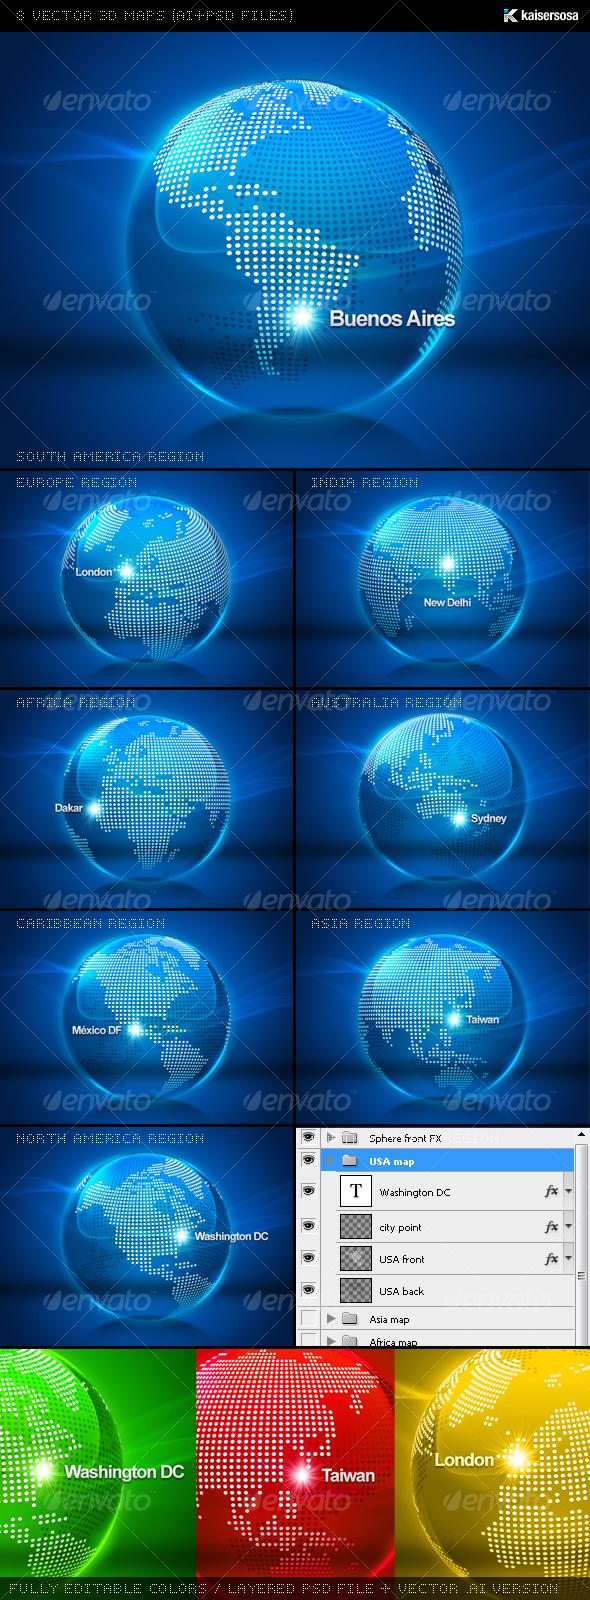 GraphicRiver 8 Vector 3D Maps AI&PSD Files 70866